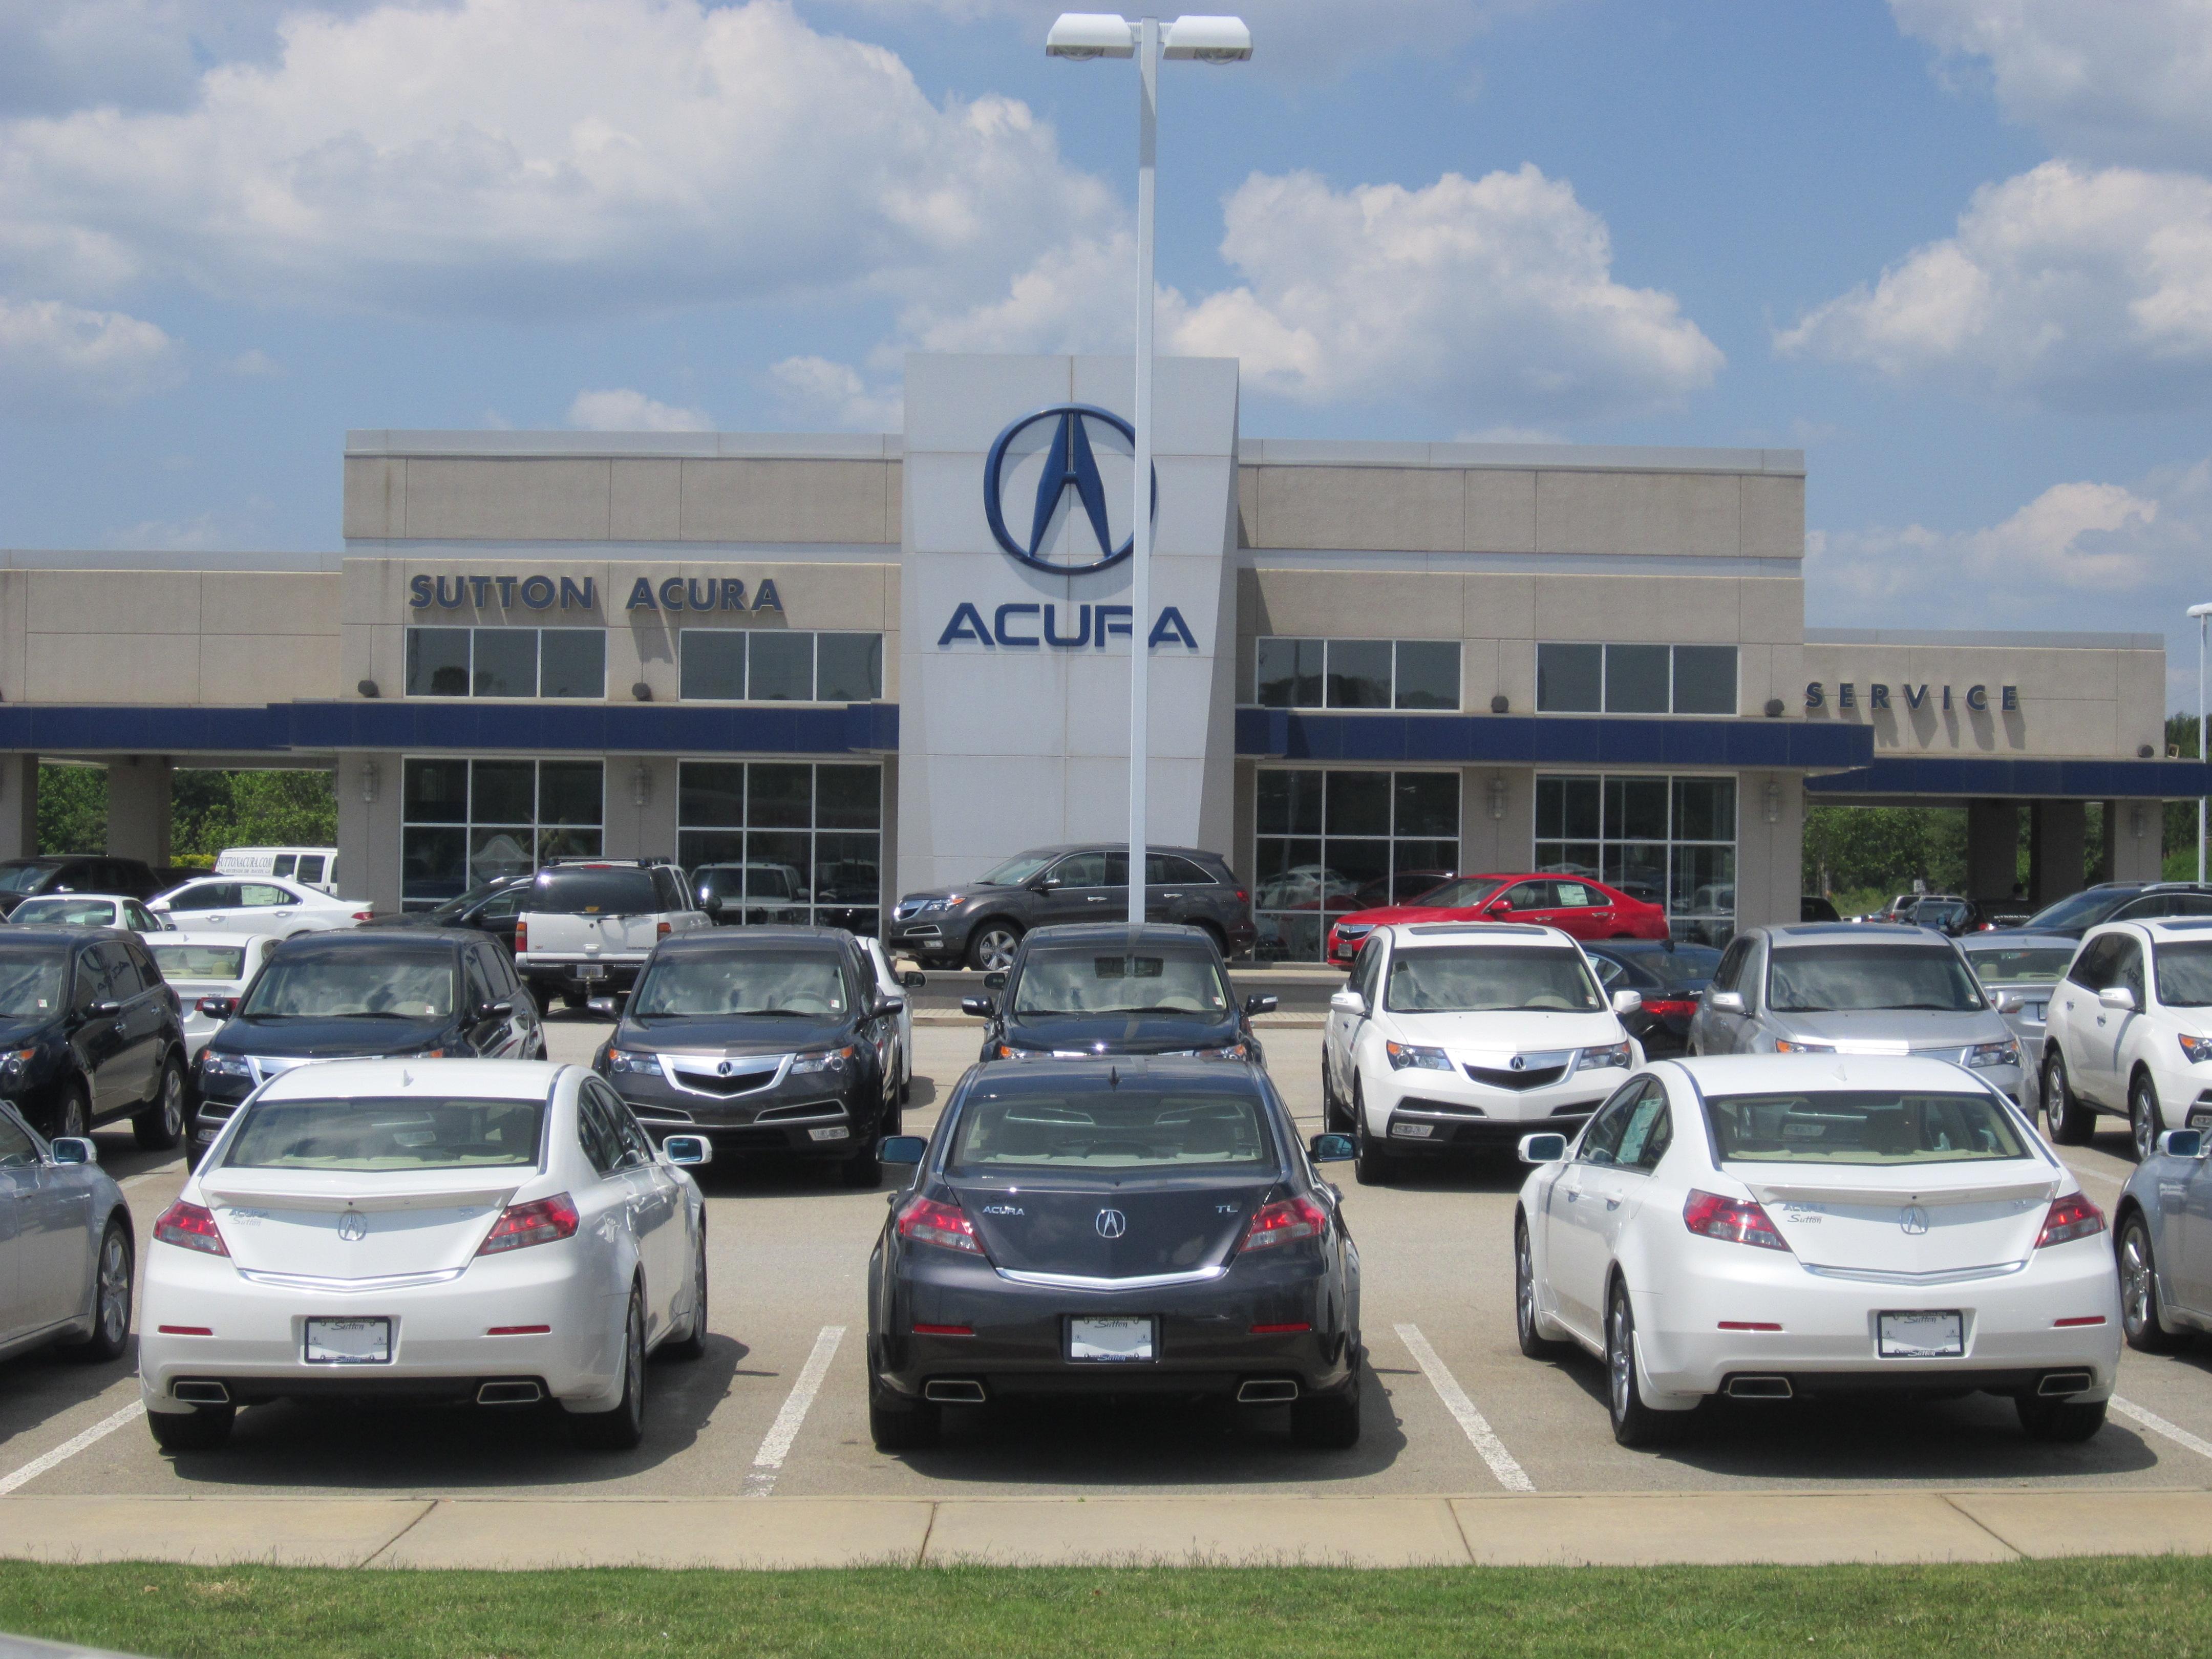 awd pkg autoform mdx acura vancouver austin technology vehicles dealership